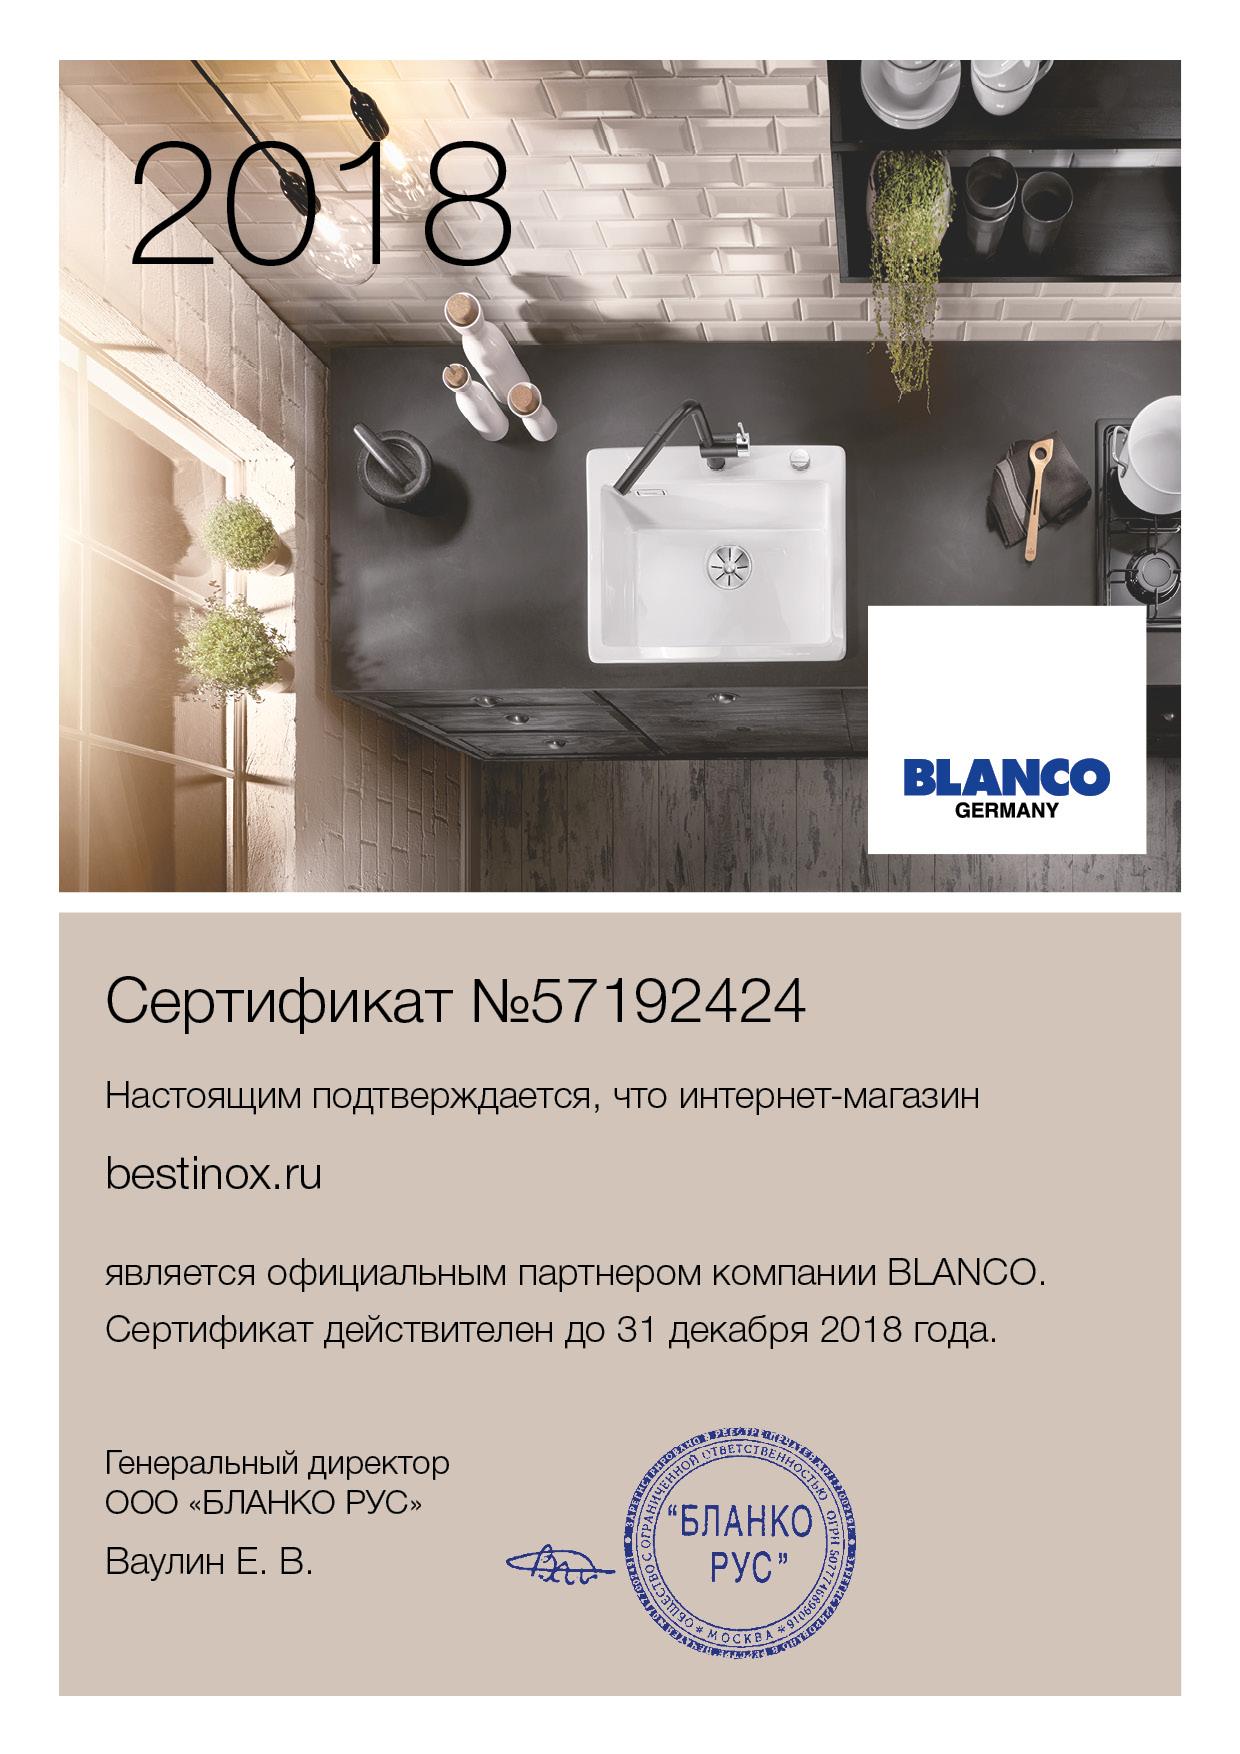 blanco-certificate